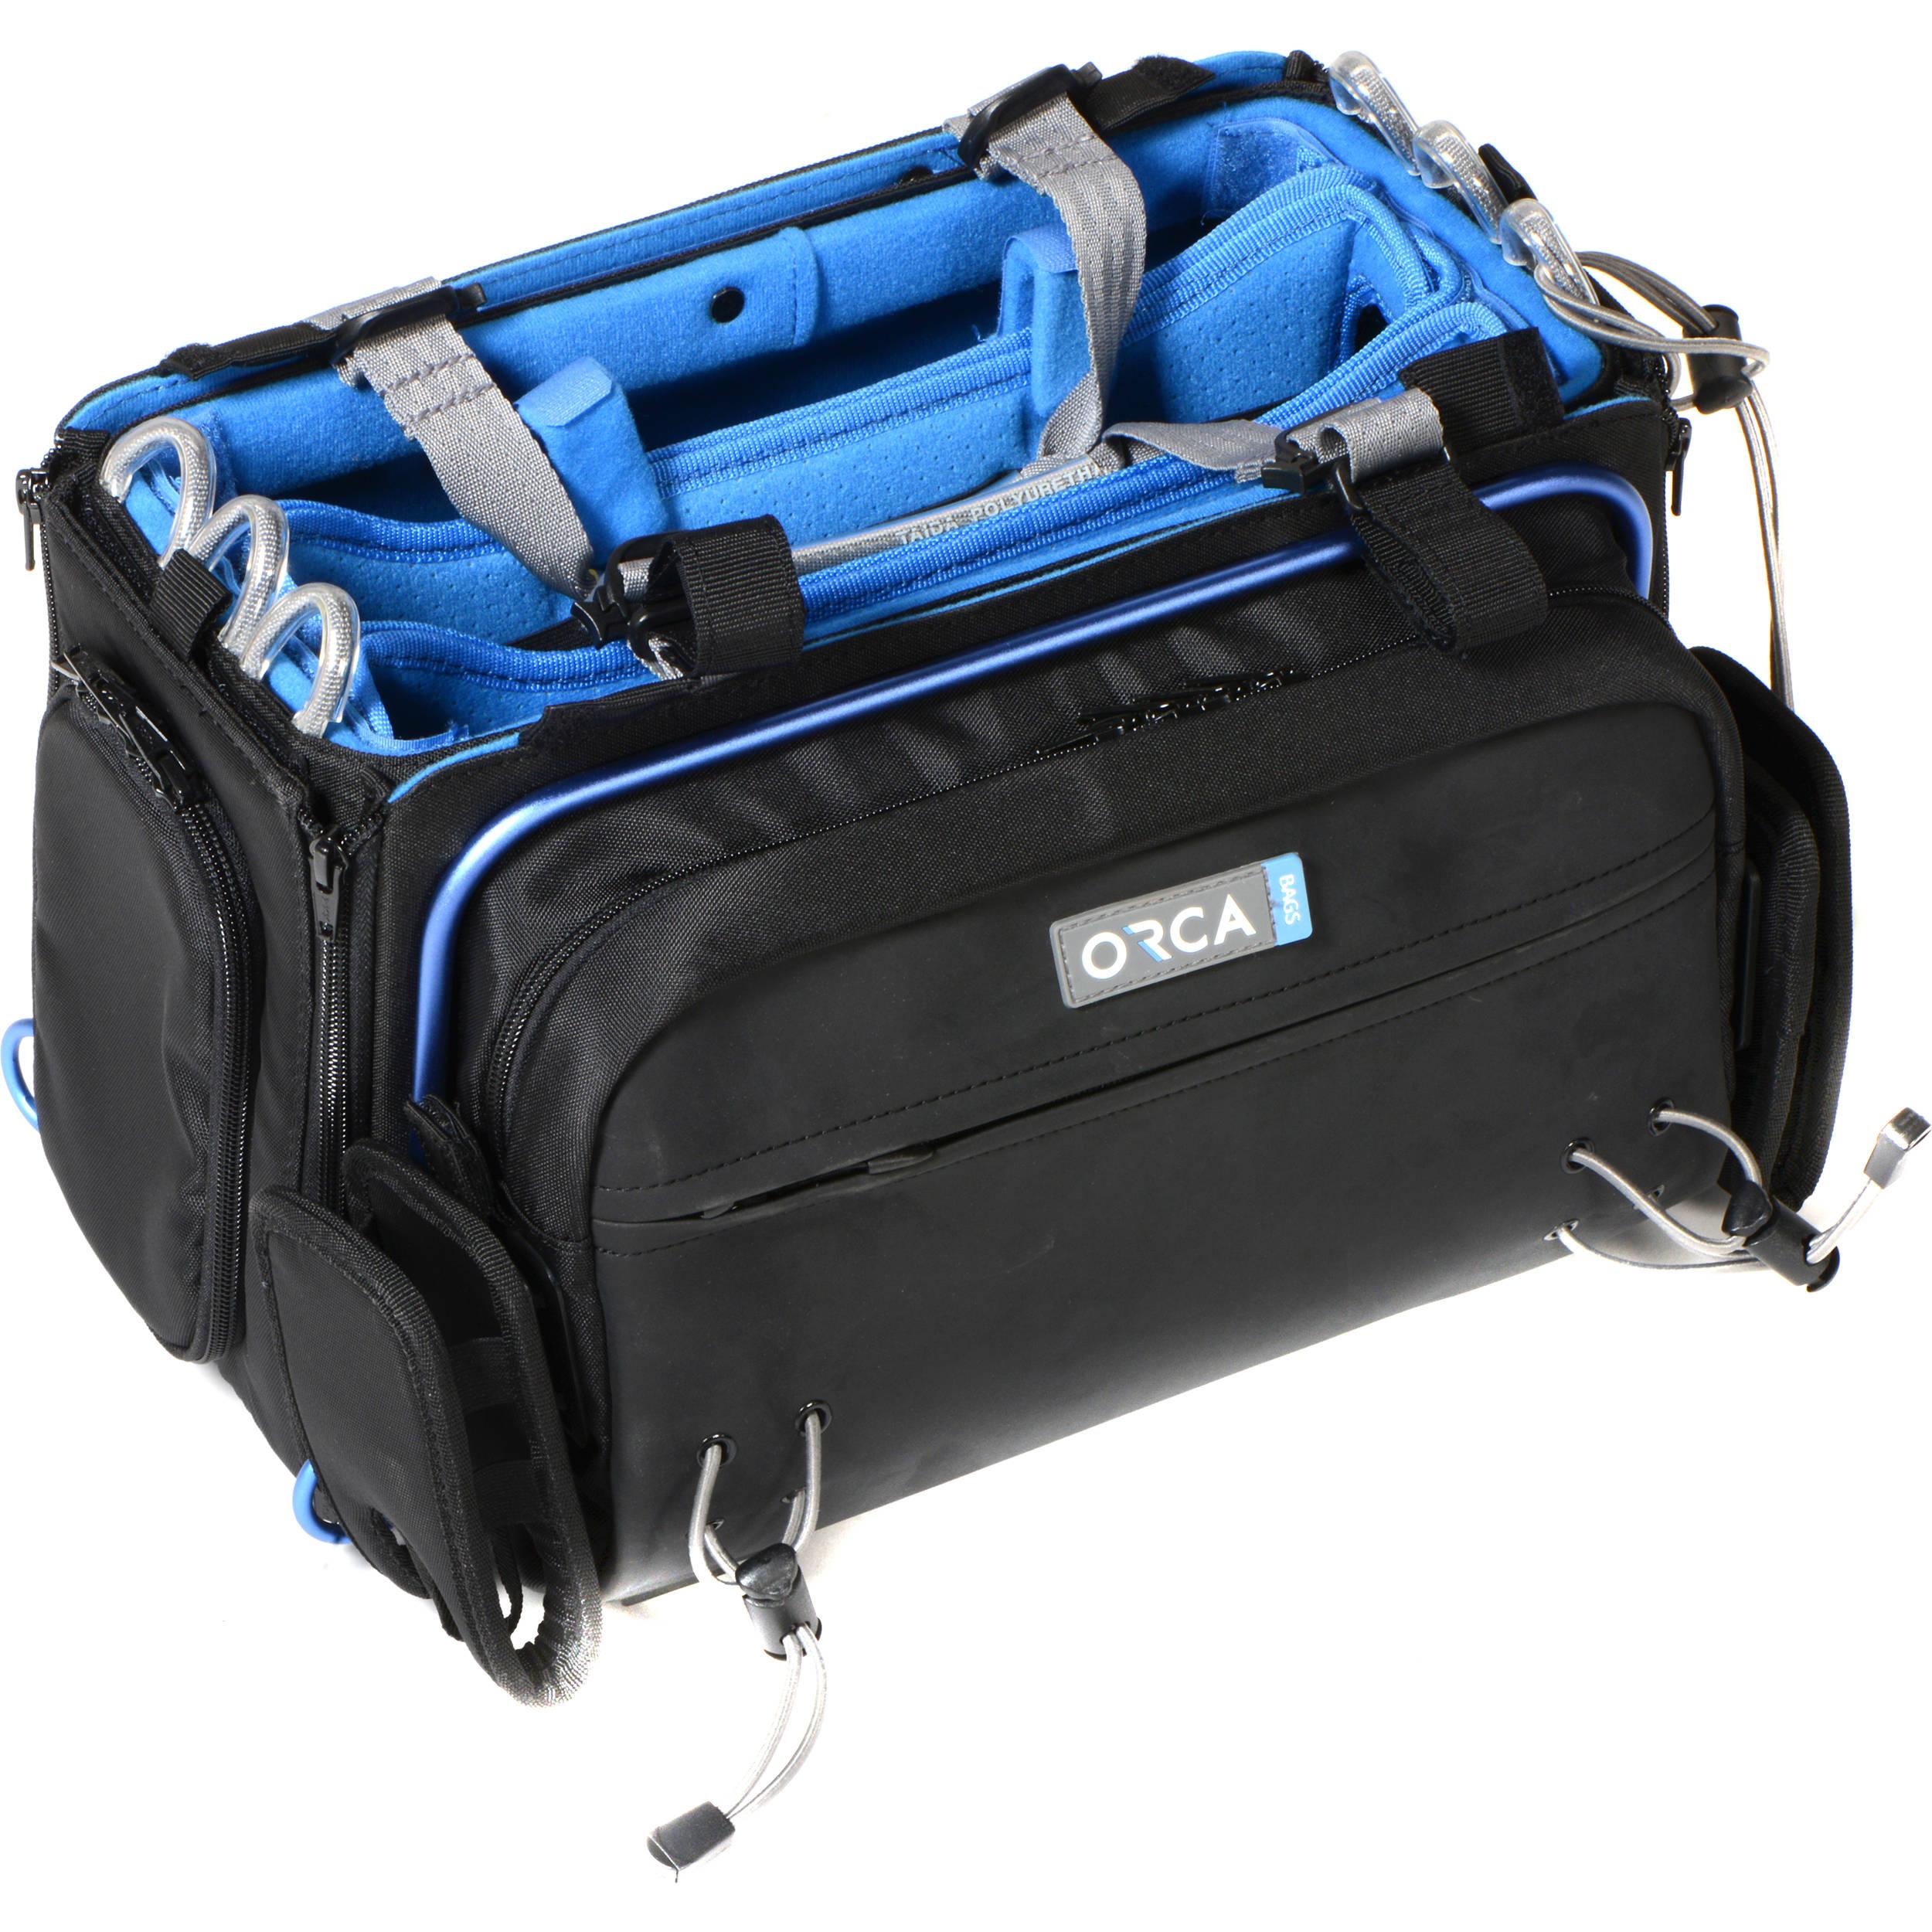 Orca Or 32 Audio Mixer Bag